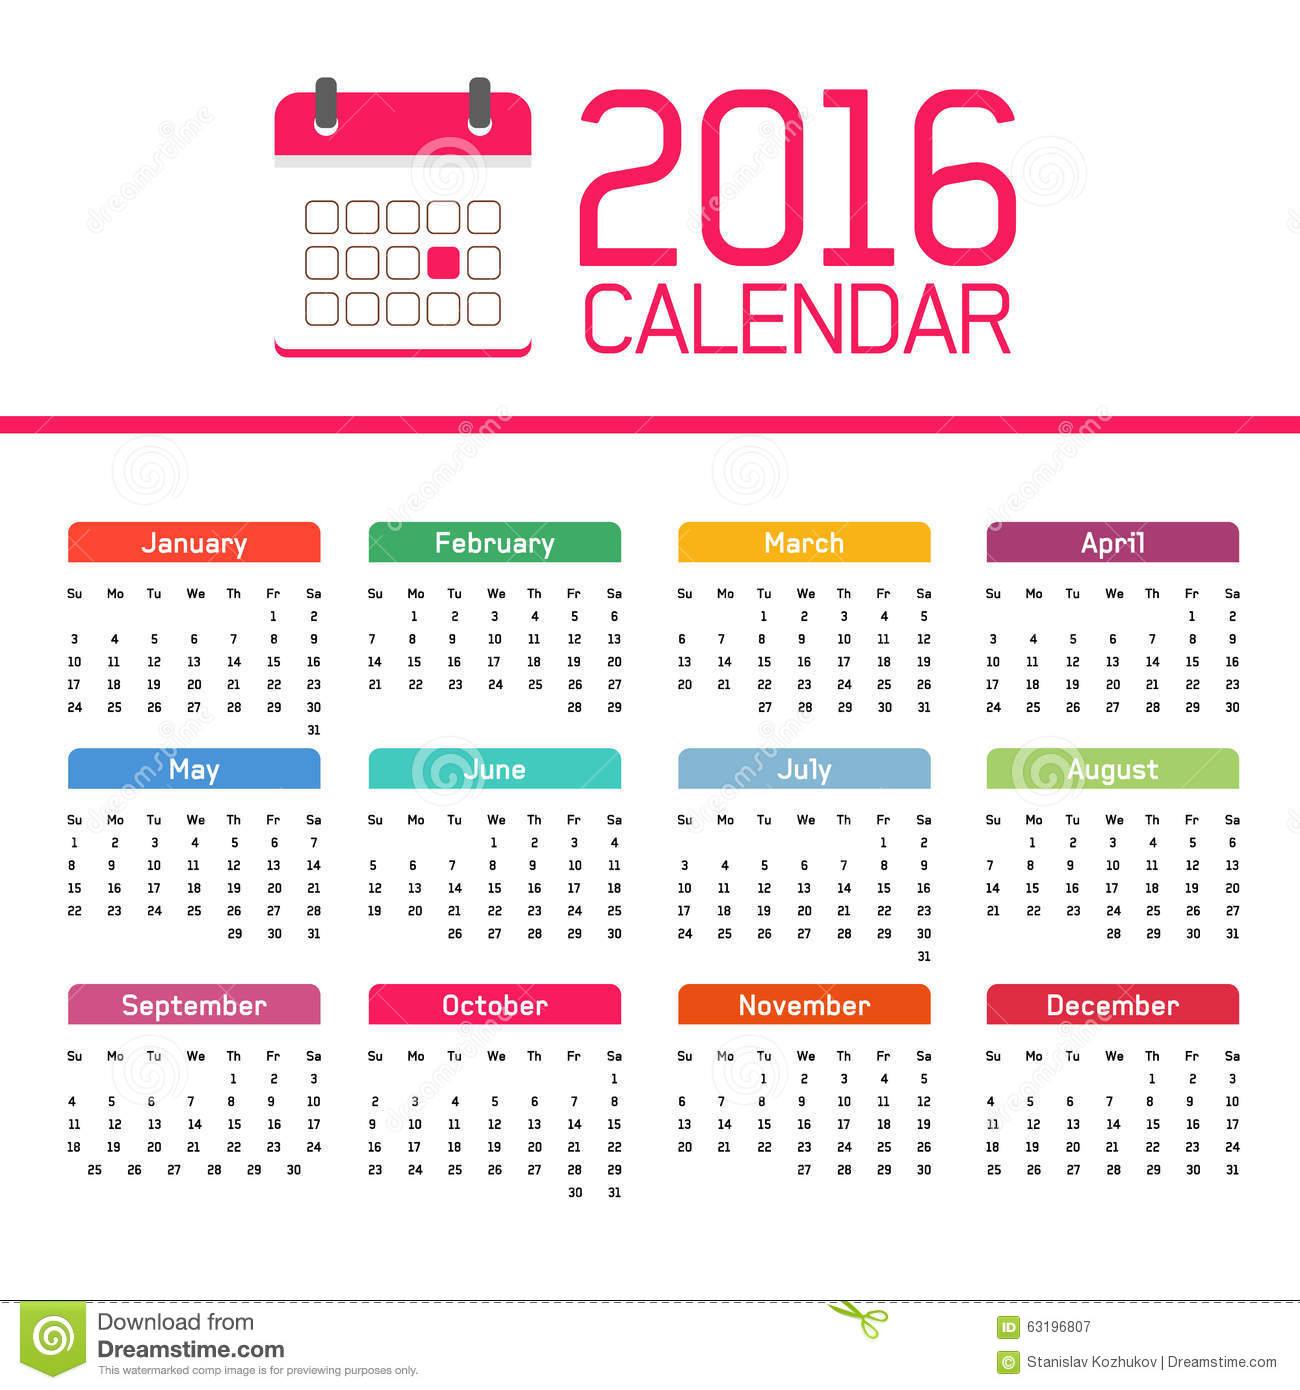 13 Month Calendar Reddit  13 Month Calendar Reddit Info for 13 Month Calendar Reddit